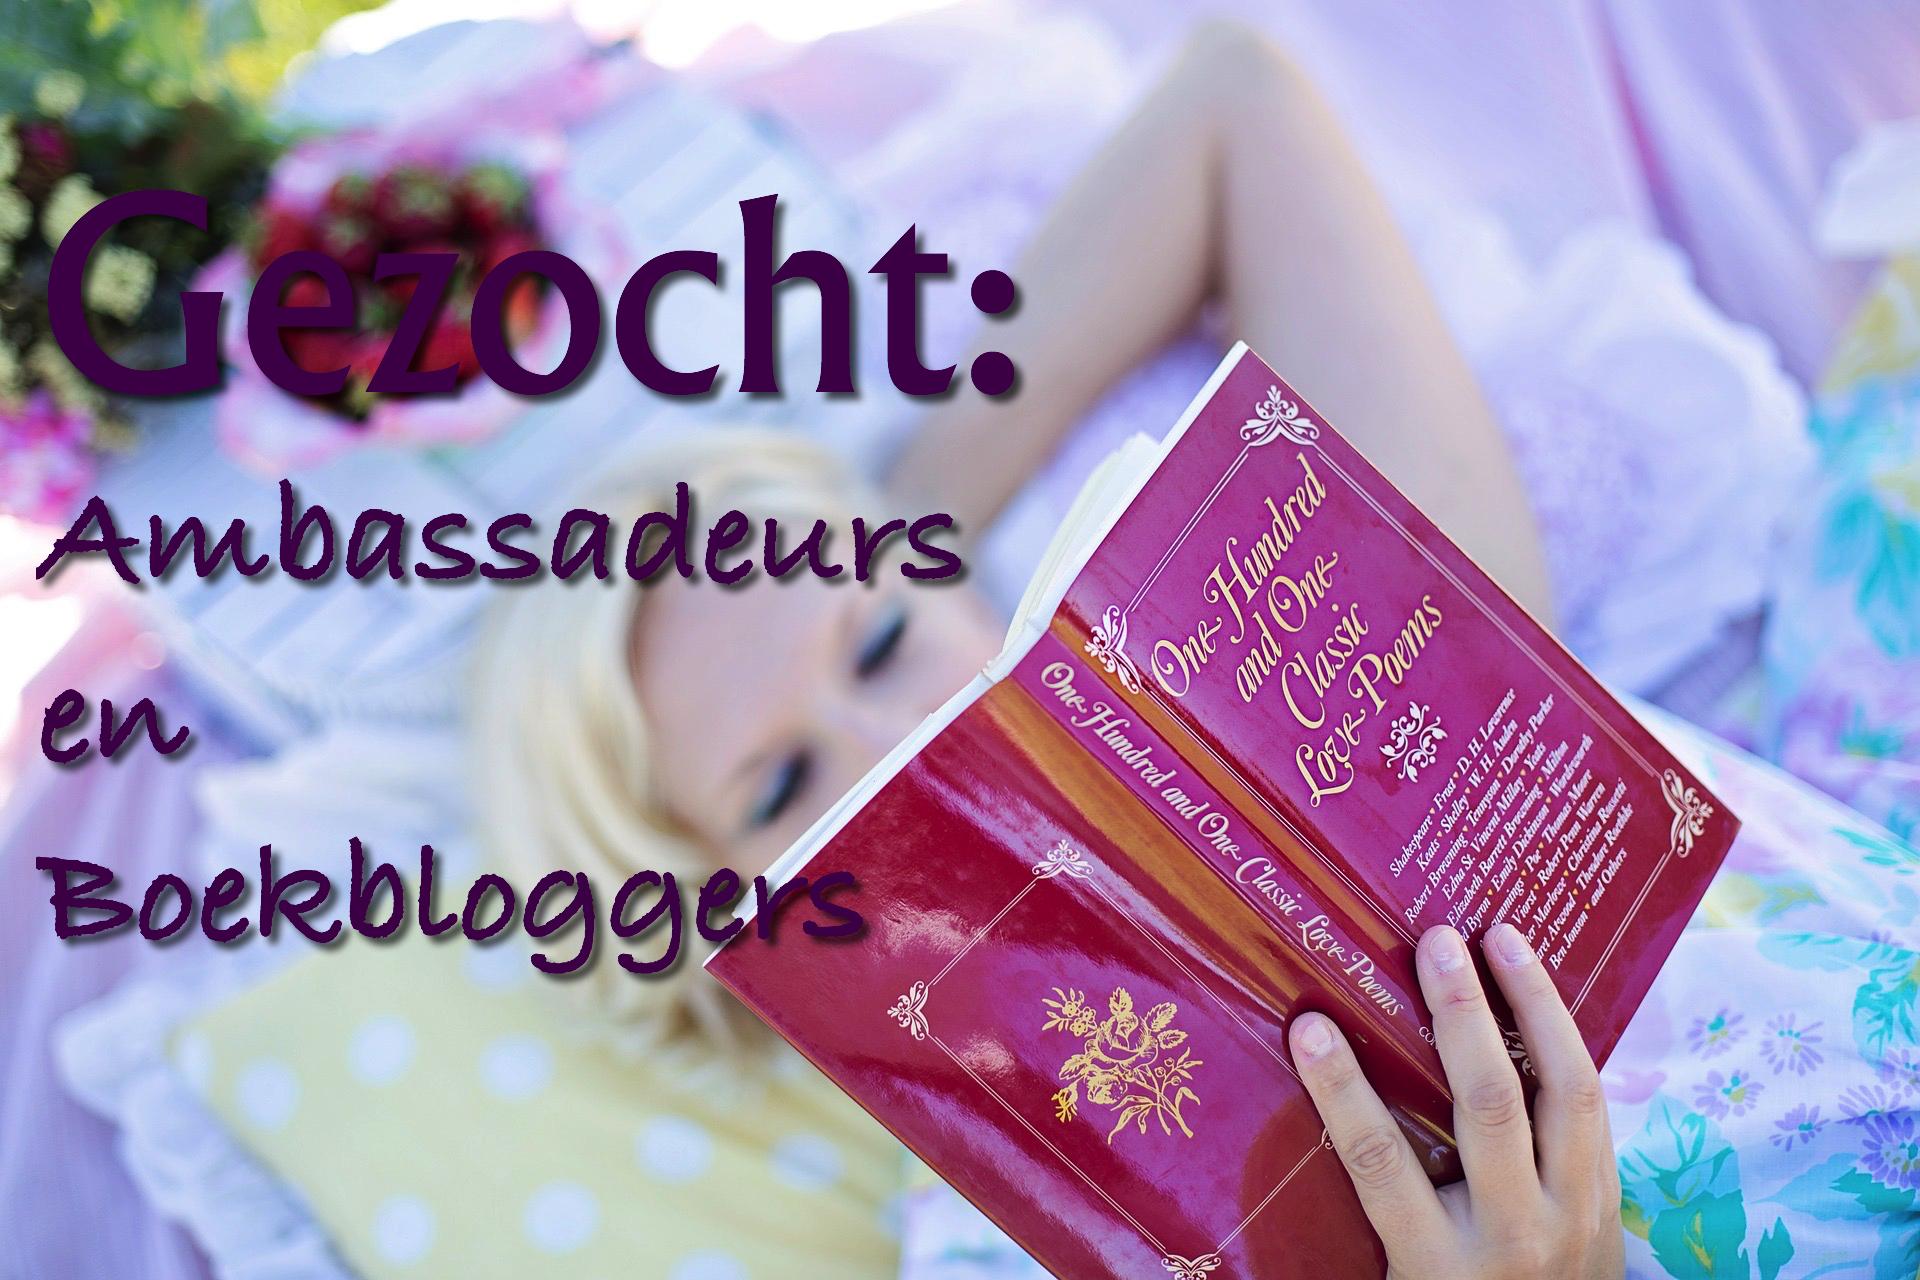 ambassadeurs-en-boekbloggers-gezocht